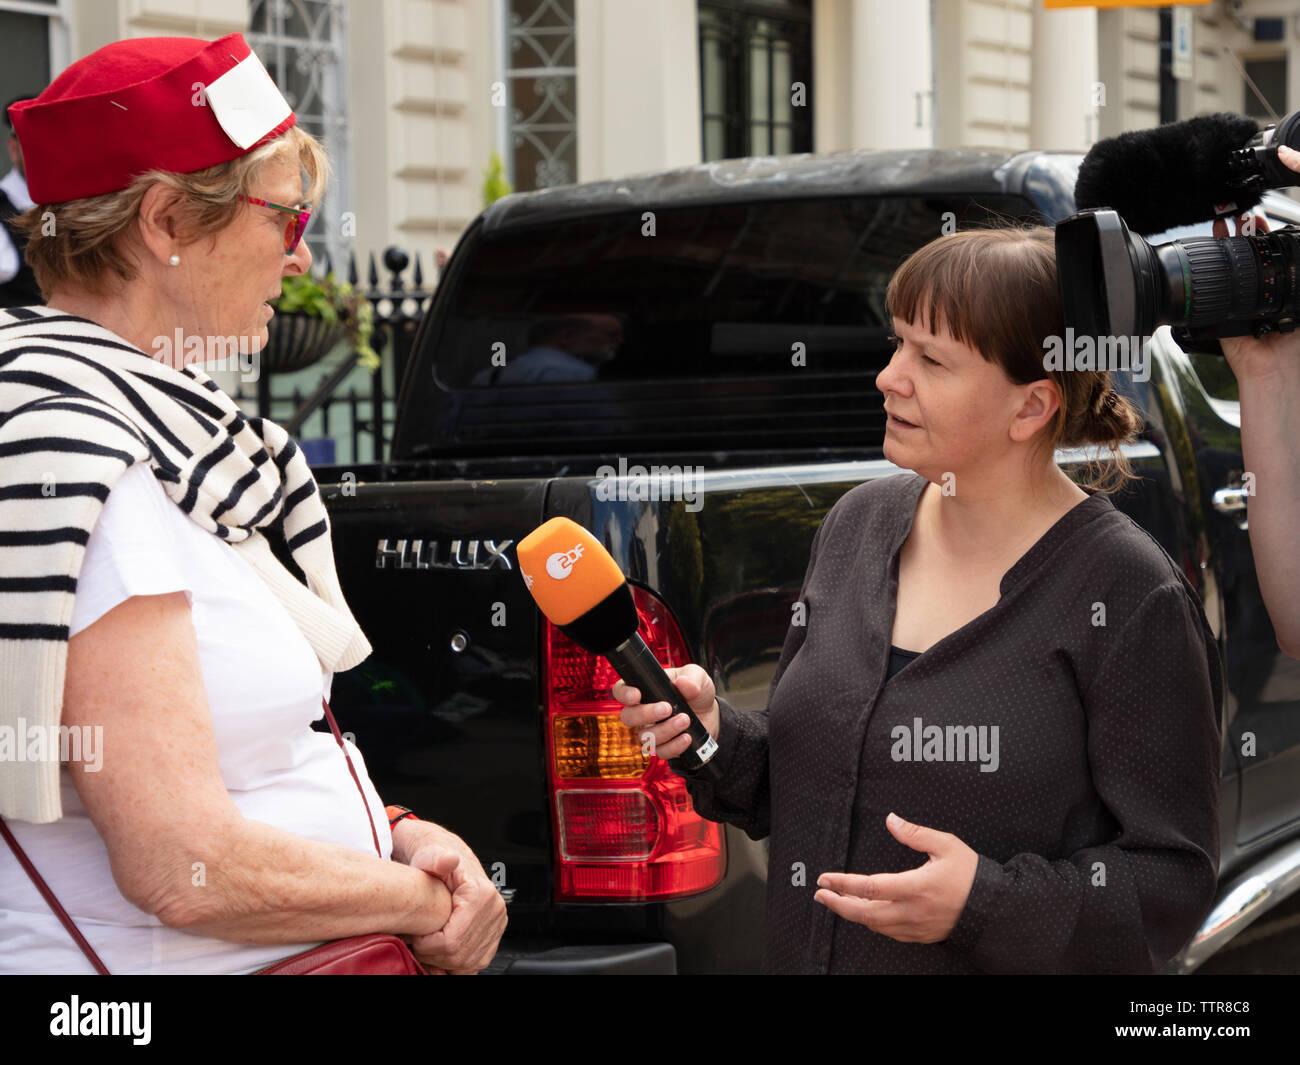 Zdf German Television Stock Photos & Zdf German Television